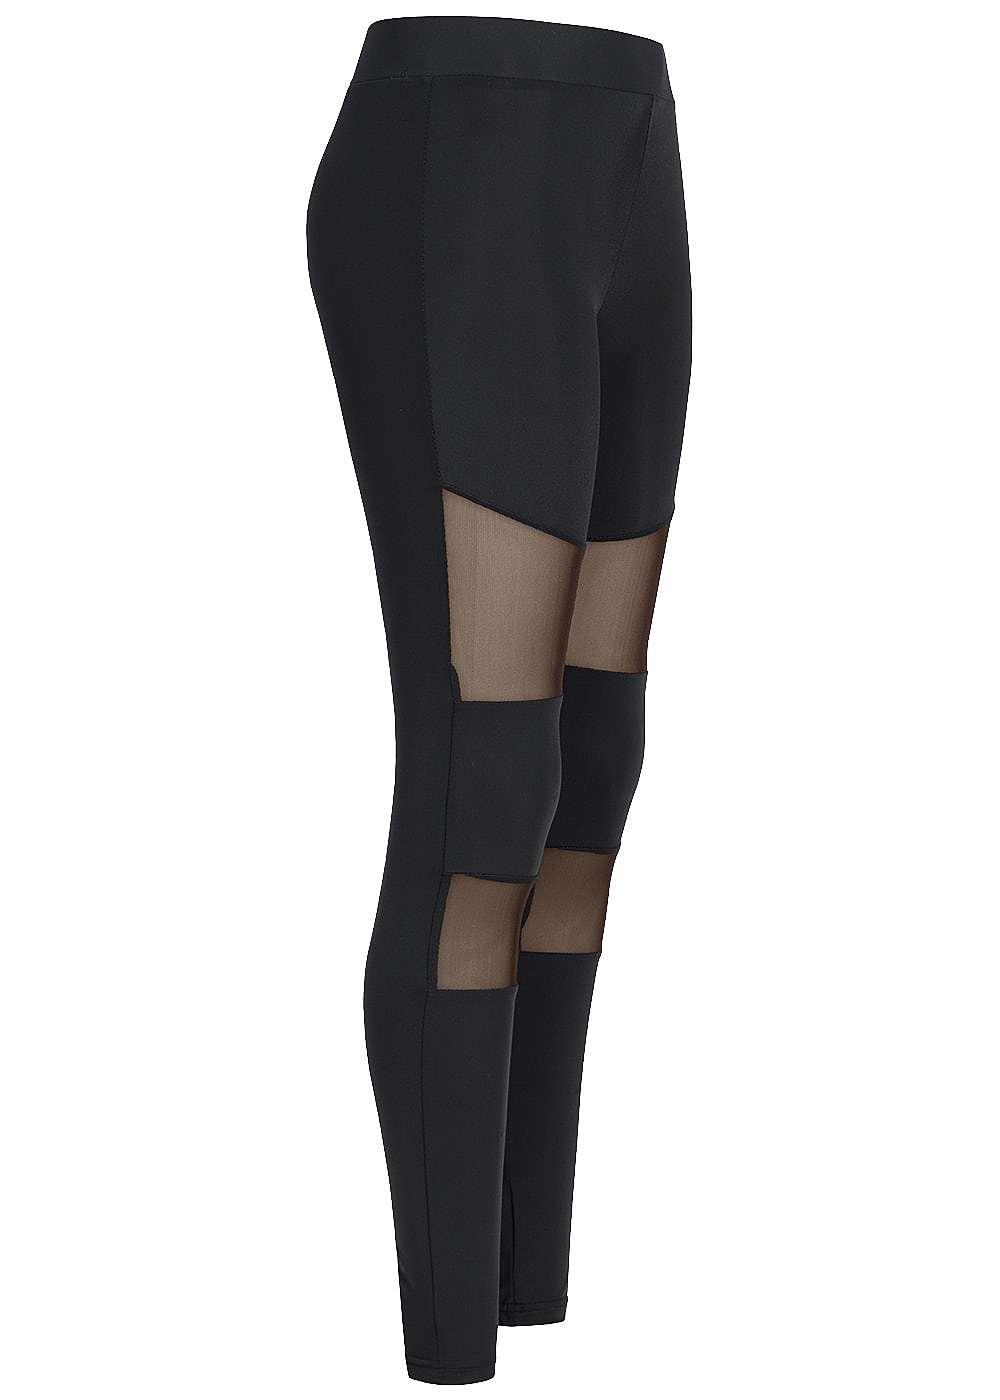 seventyseven lifestyle damen leggings gummibund mesh. Black Bedroom Furniture Sets. Home Design Ideas